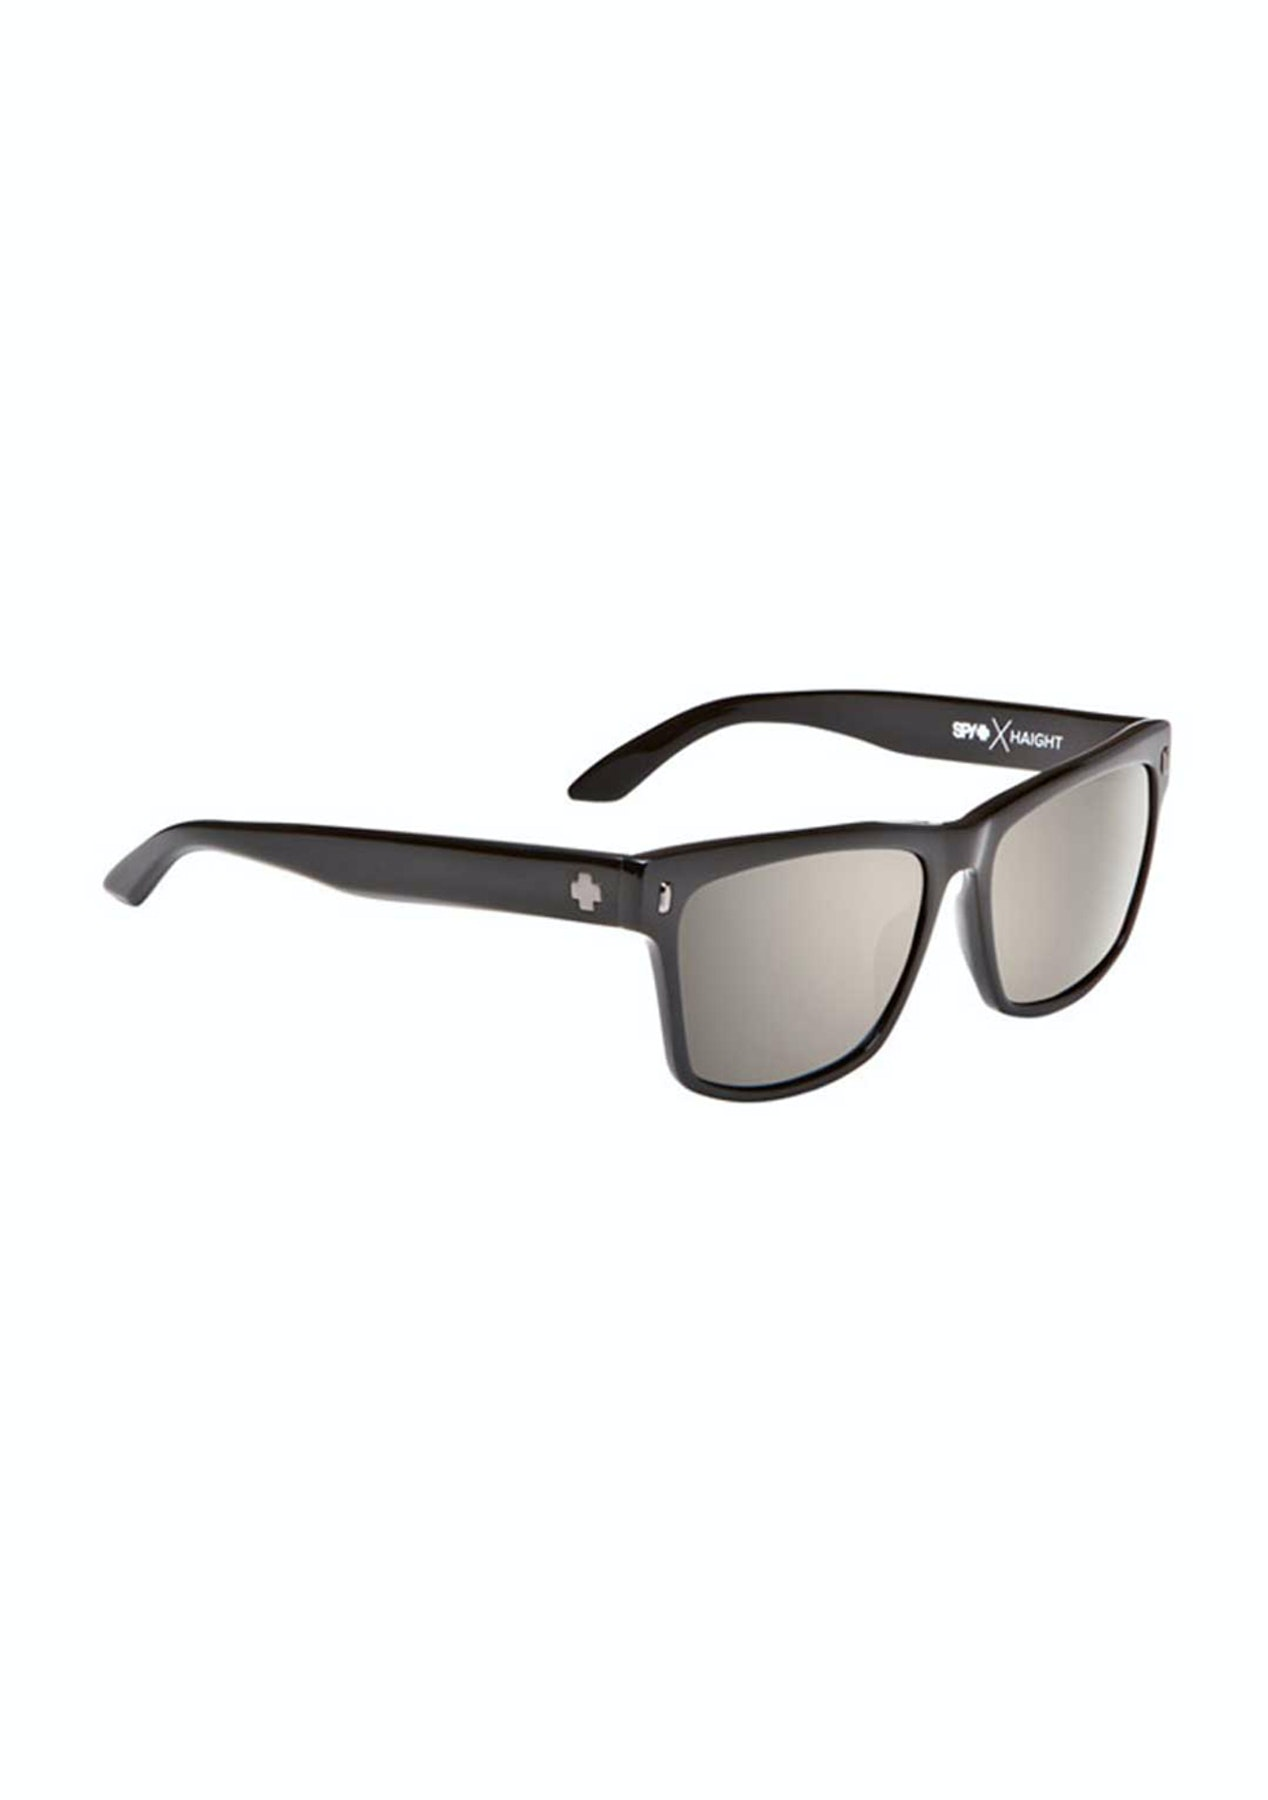 4c6c320fb8 SPY Sunglasses Haight Closeout - Sunglasses Super Sale - Onceit